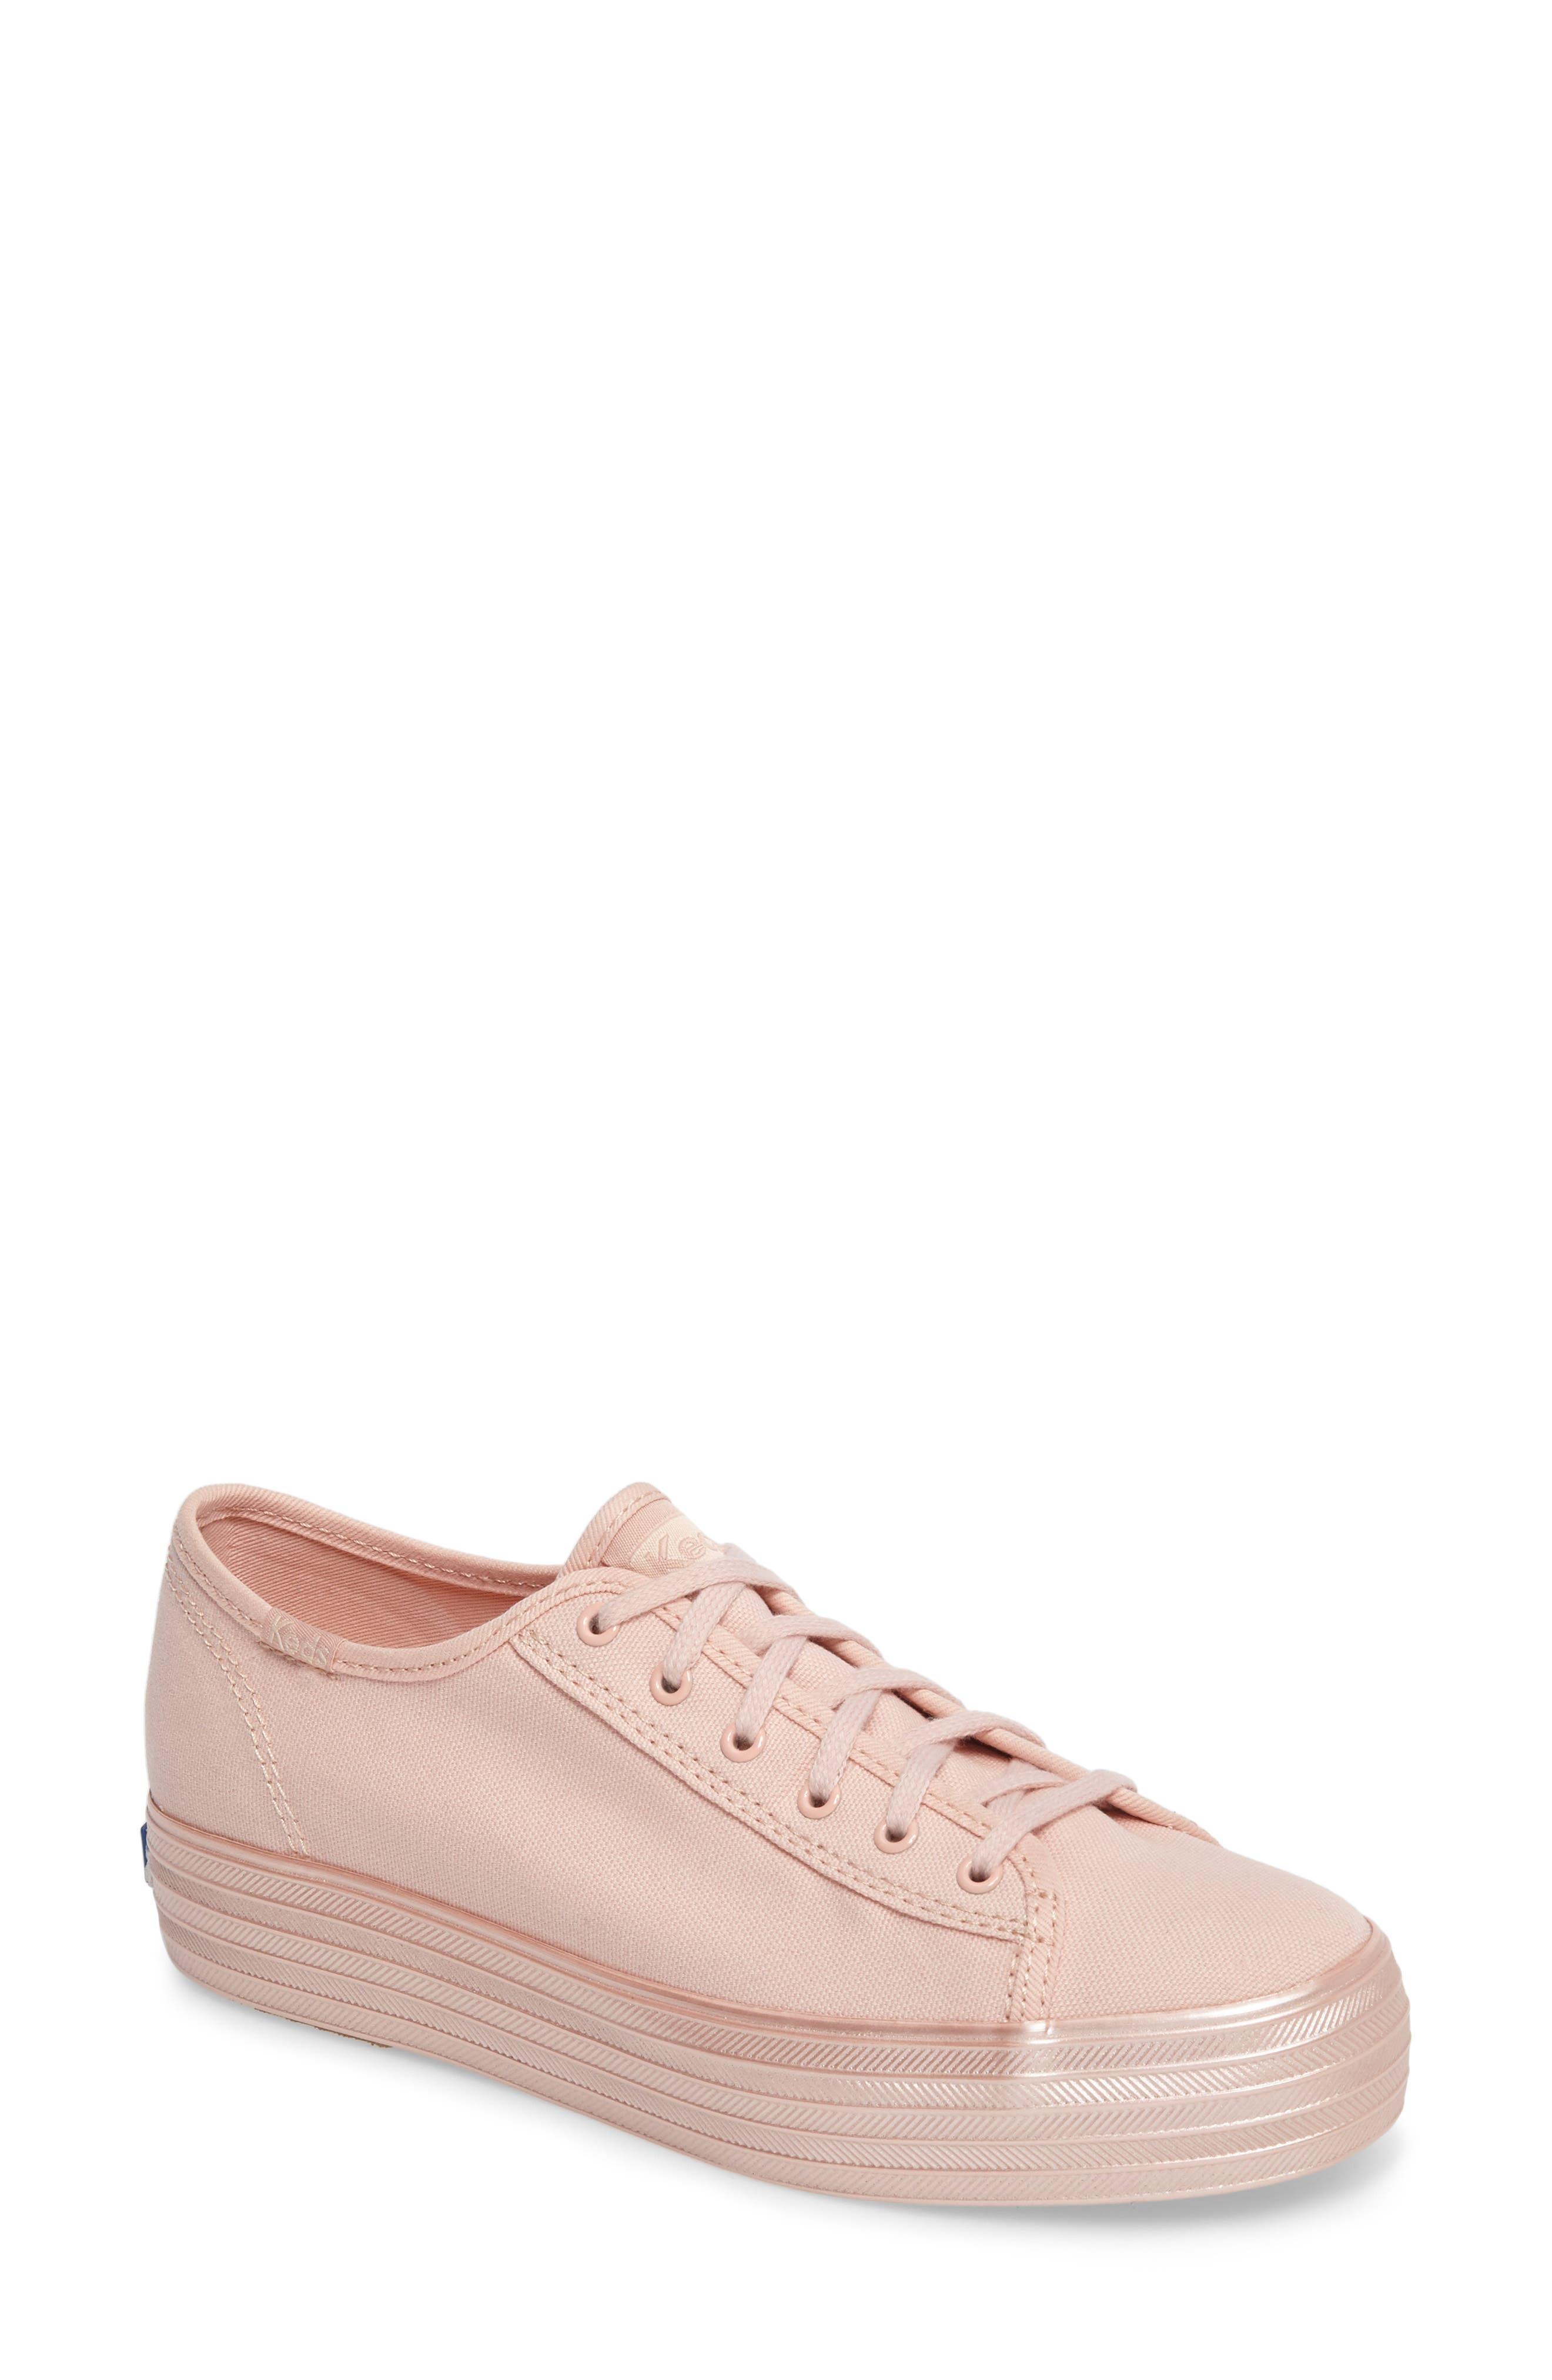 Alternate Image 1 Selected - Keds® Triple Shimmer Platform Sneaker (Women)